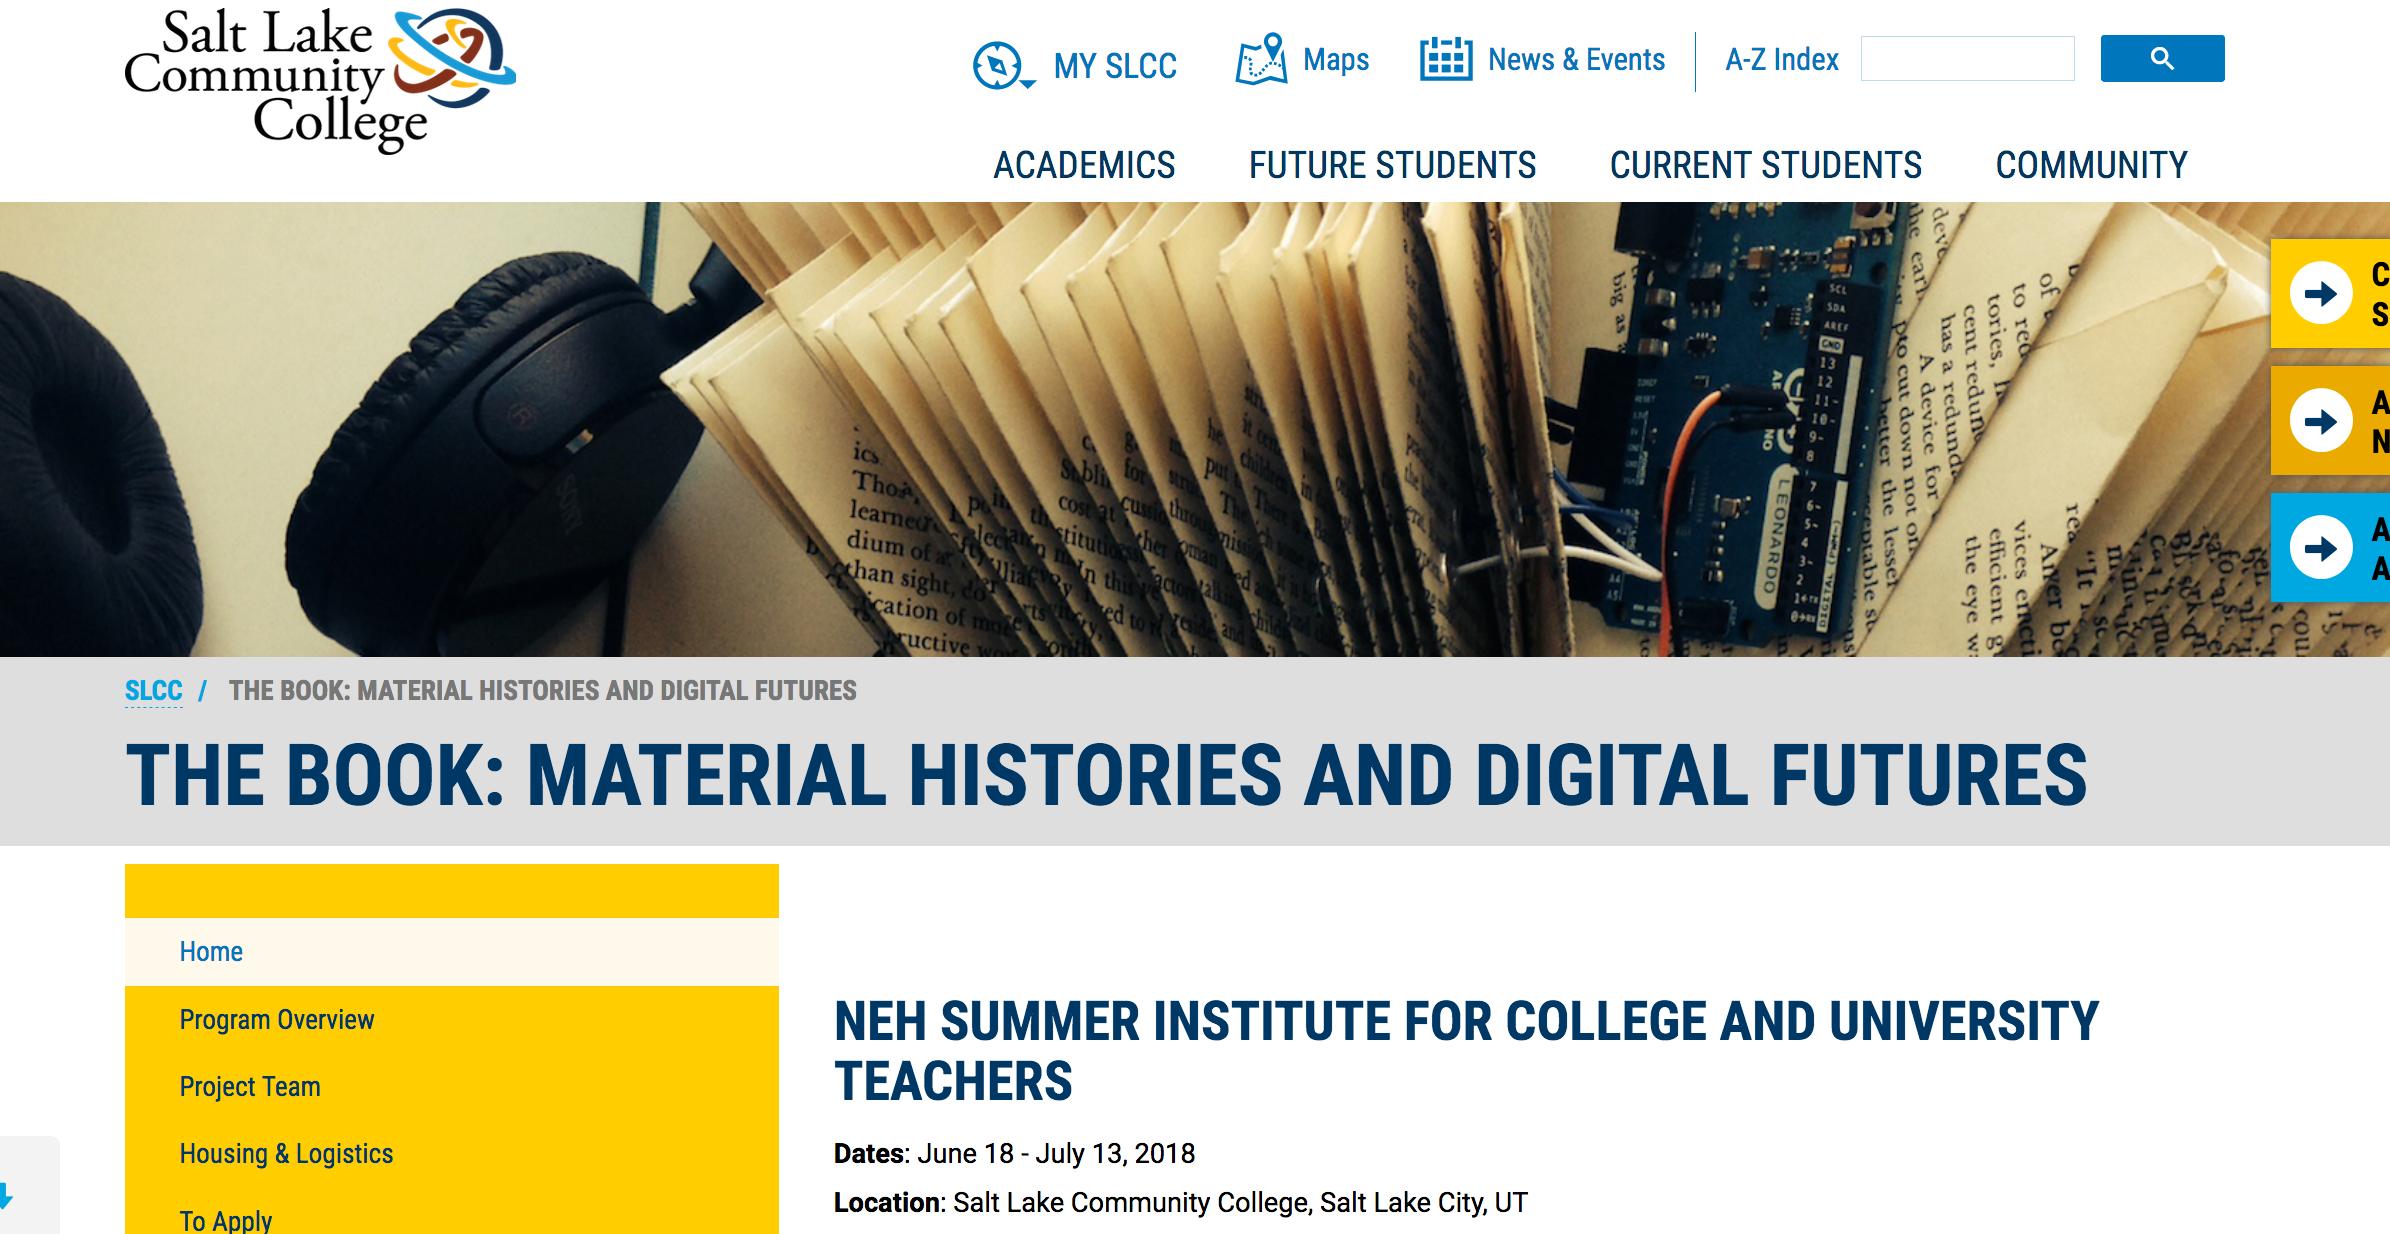 The Book: Material Histories & Digital Futures website